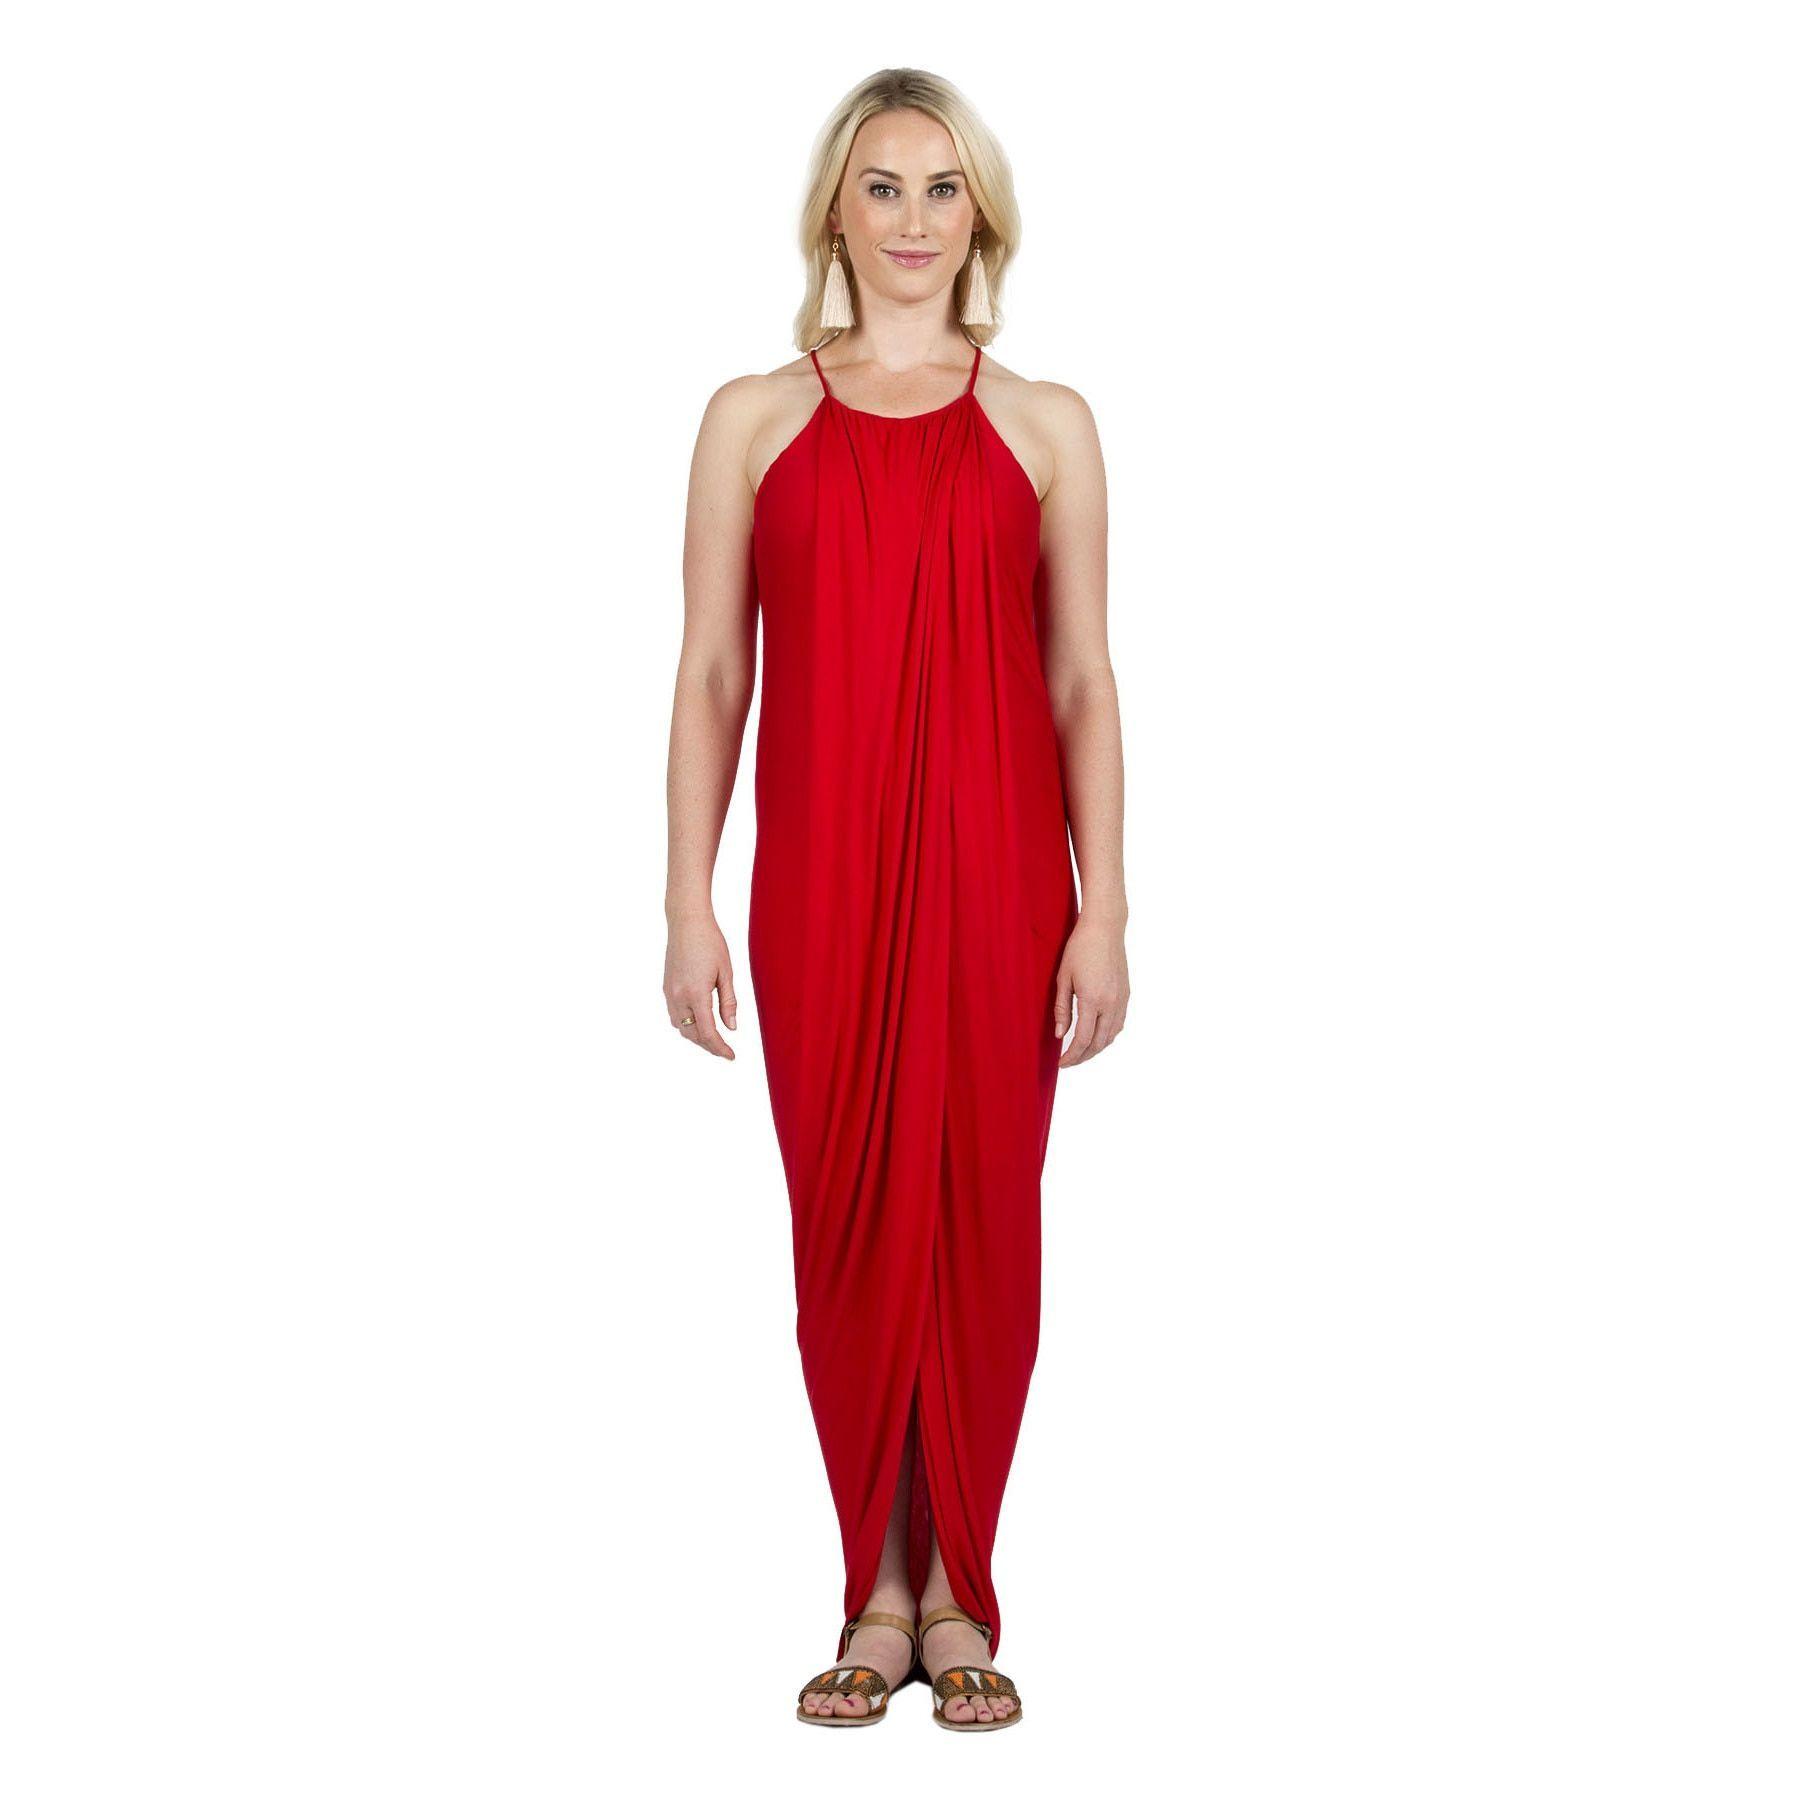 f79abf2975c Hadari Xehar Women s Sexy Flowy Maxi Dress